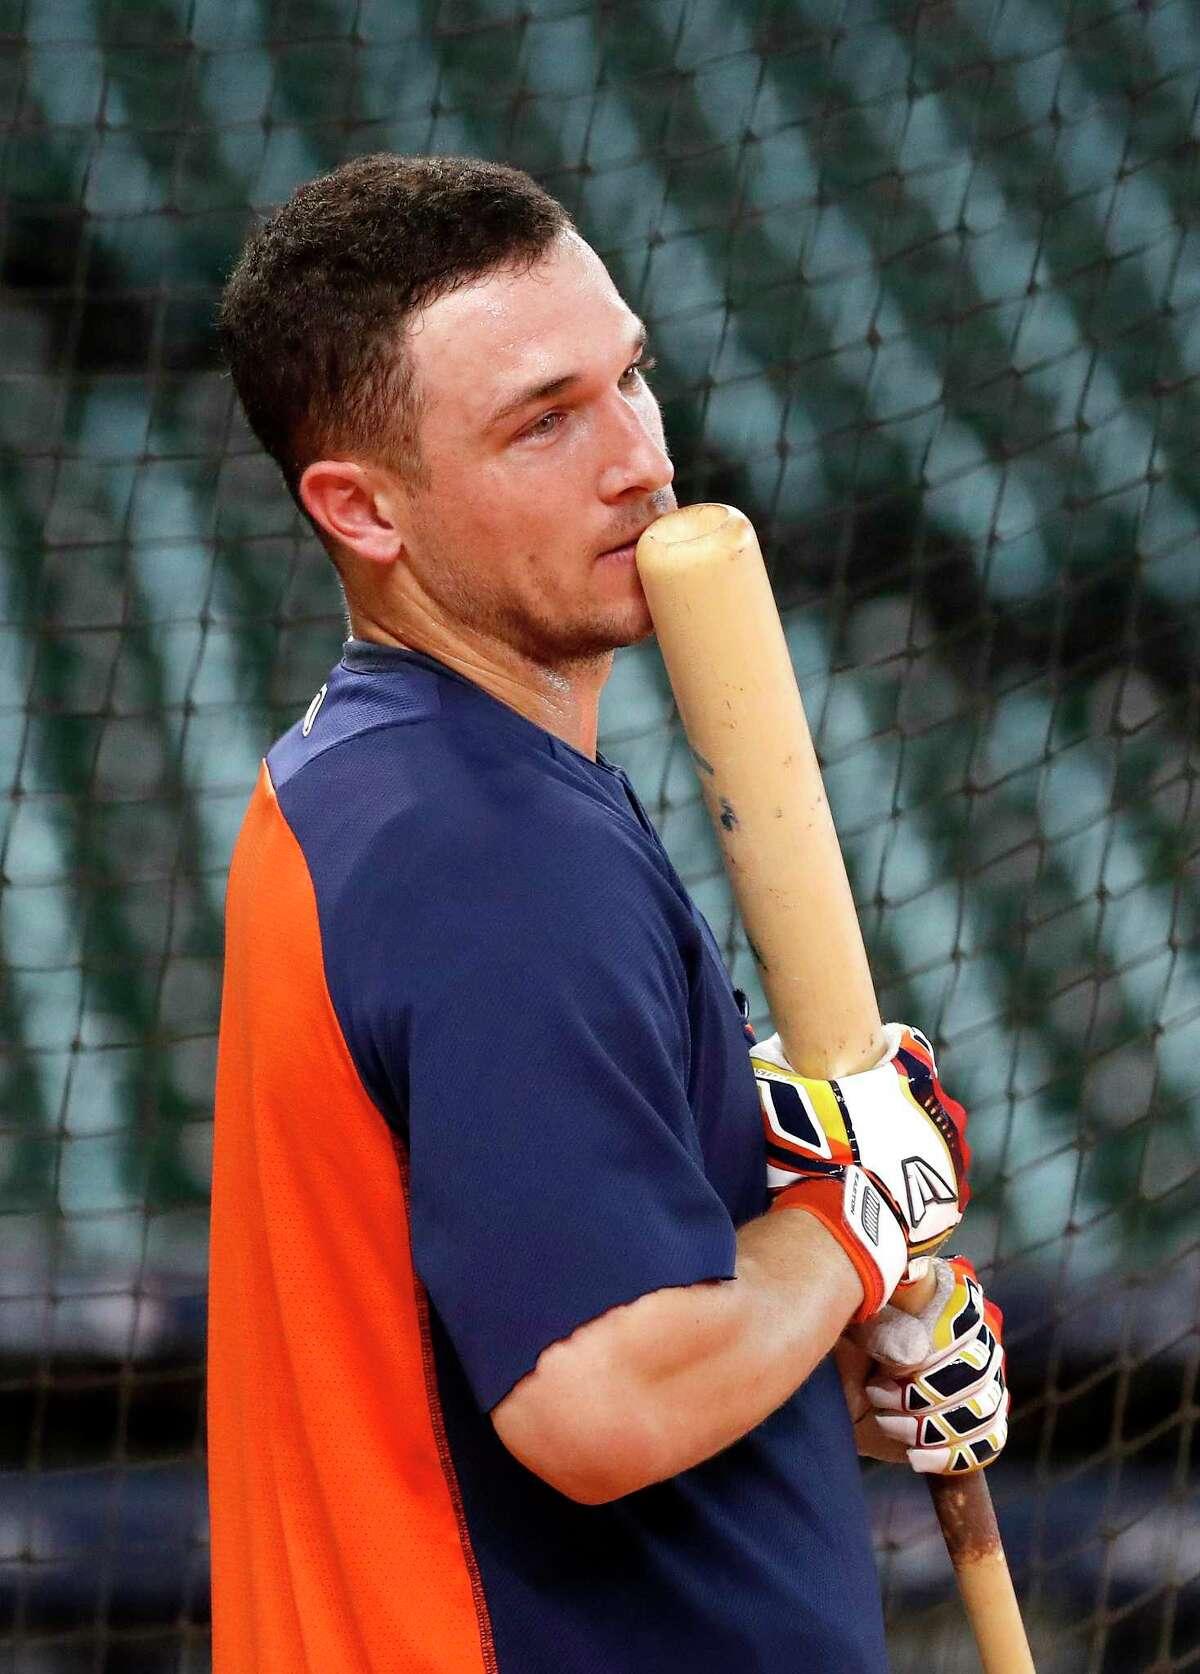 Houston Astros third baseman Alex Bregman (2) waits to bat during batting practice at Minute Maid Park, October 4, 2018, in Houston.